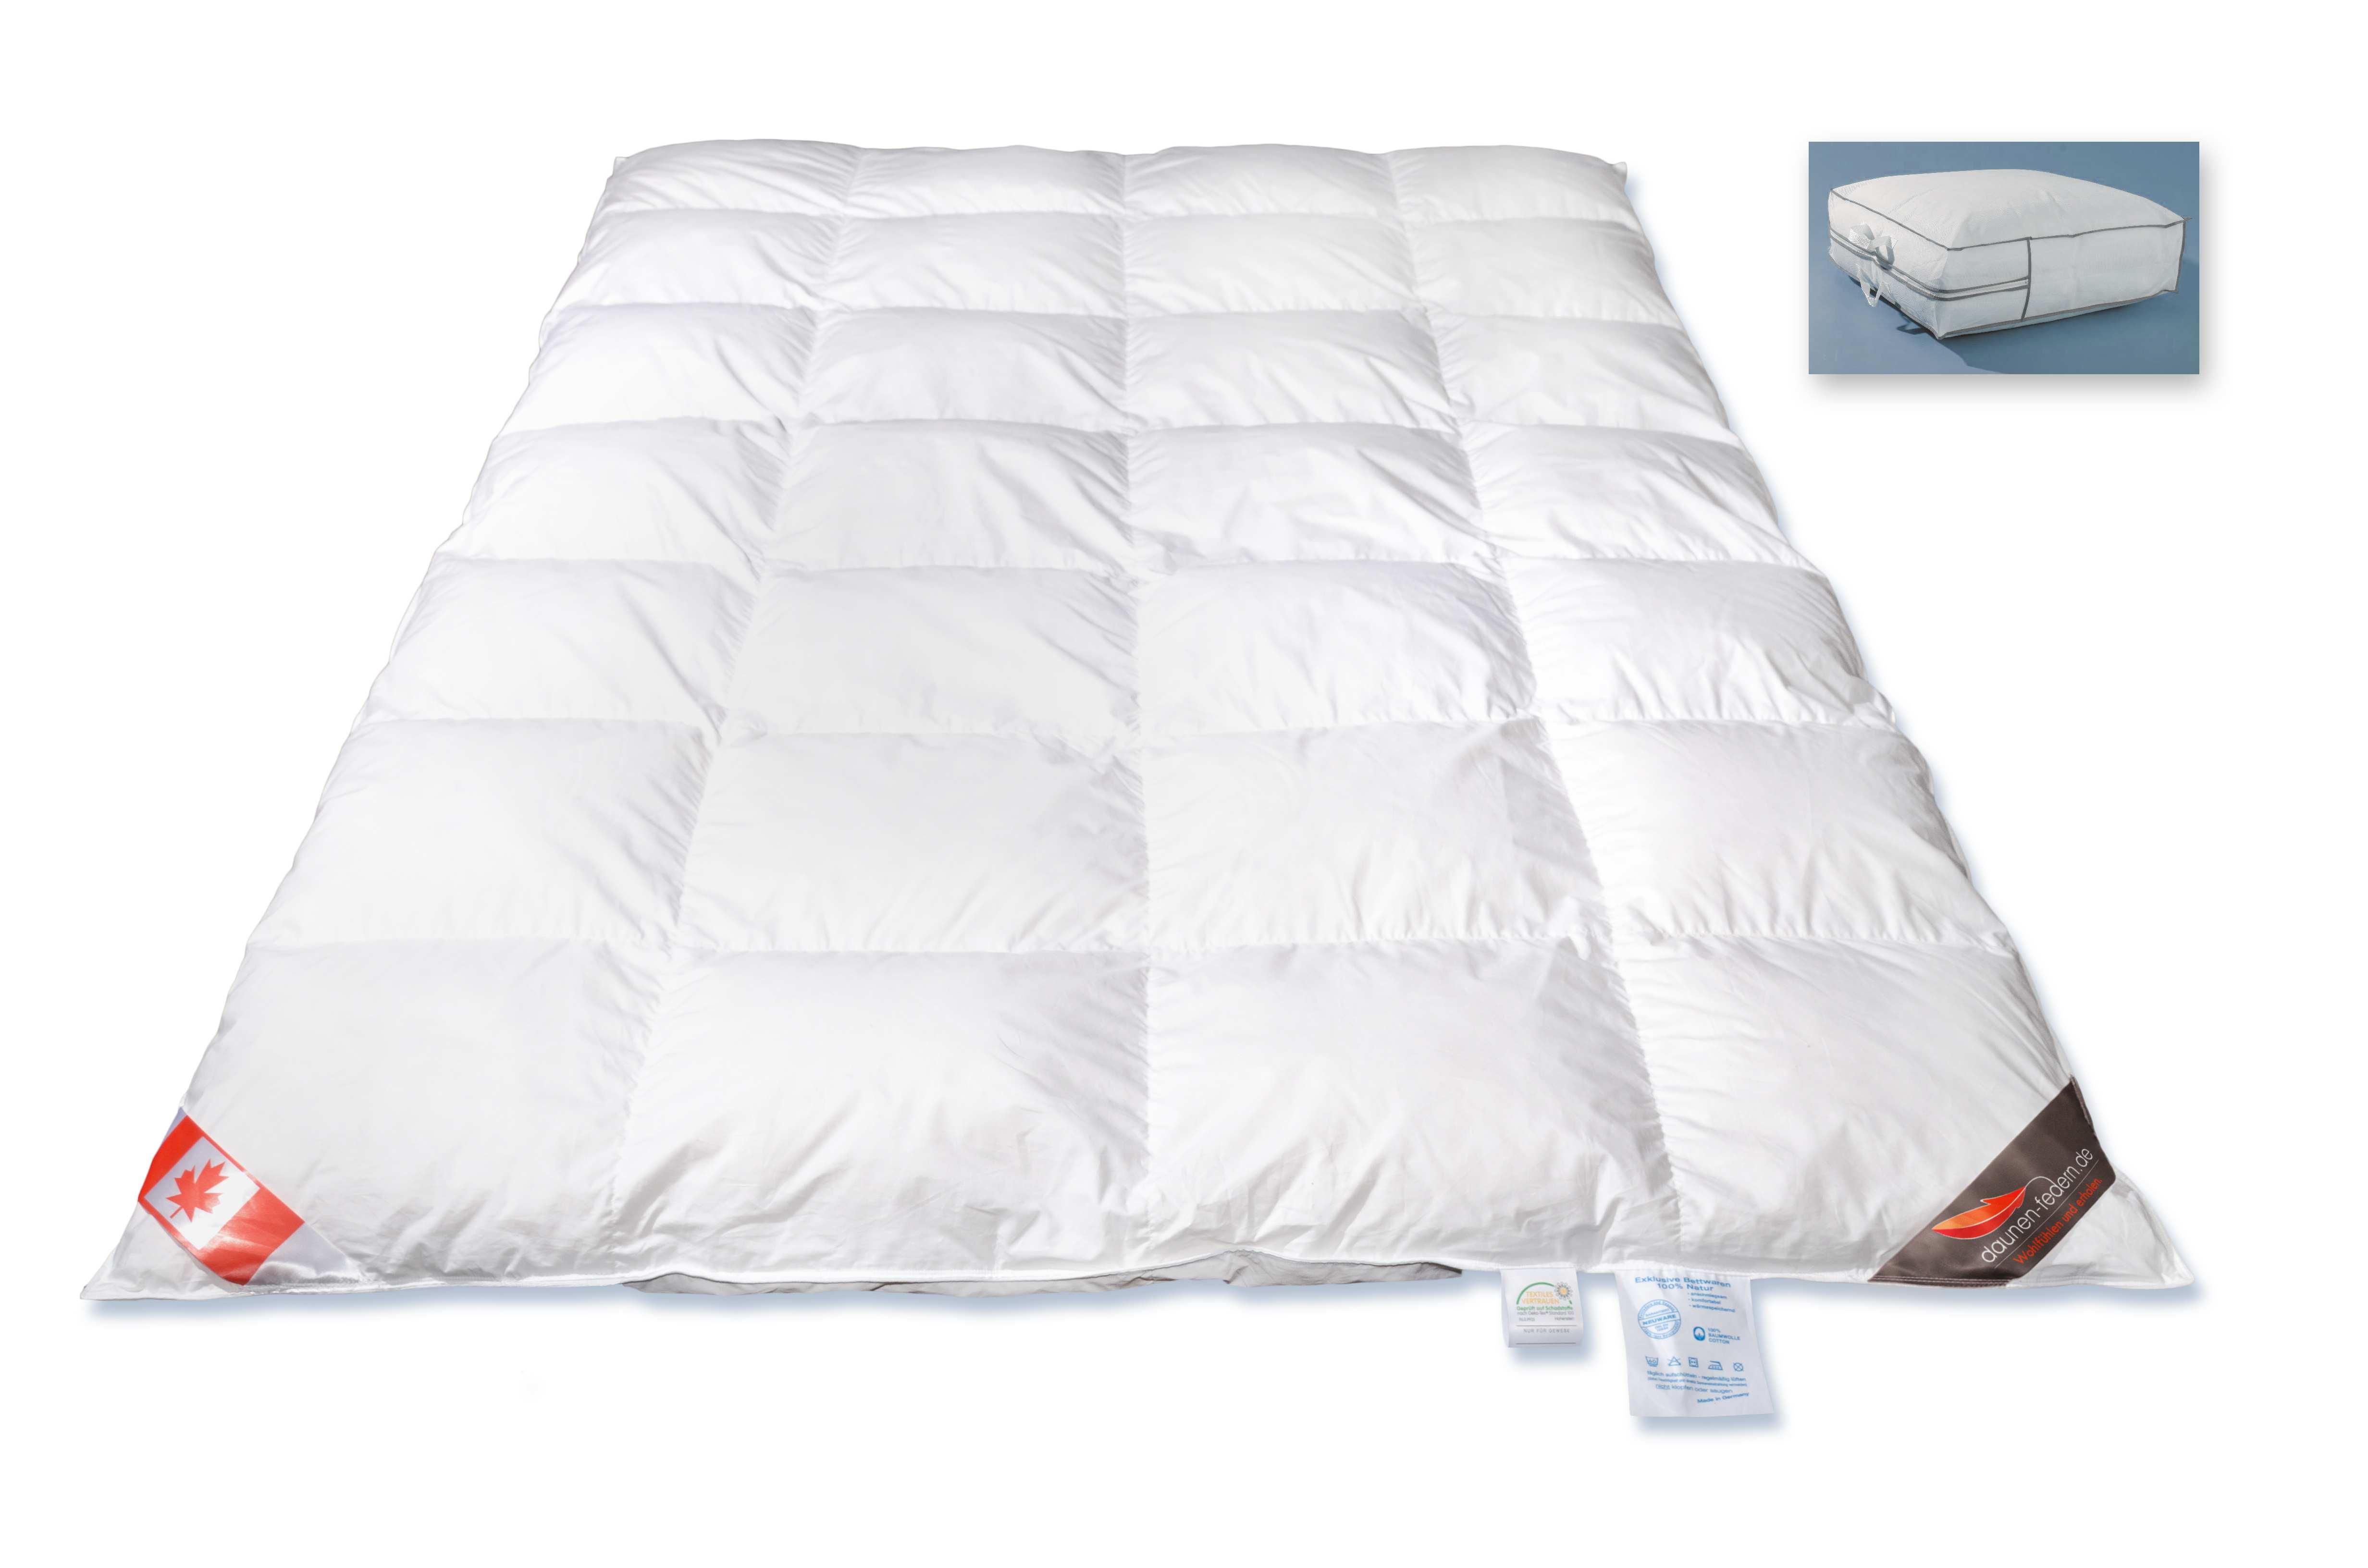 daunendecke 155x220 100 kanada g nsedaunen g nstig kaufen. Black Bedroom Furniture Sets. Home Design Ideas